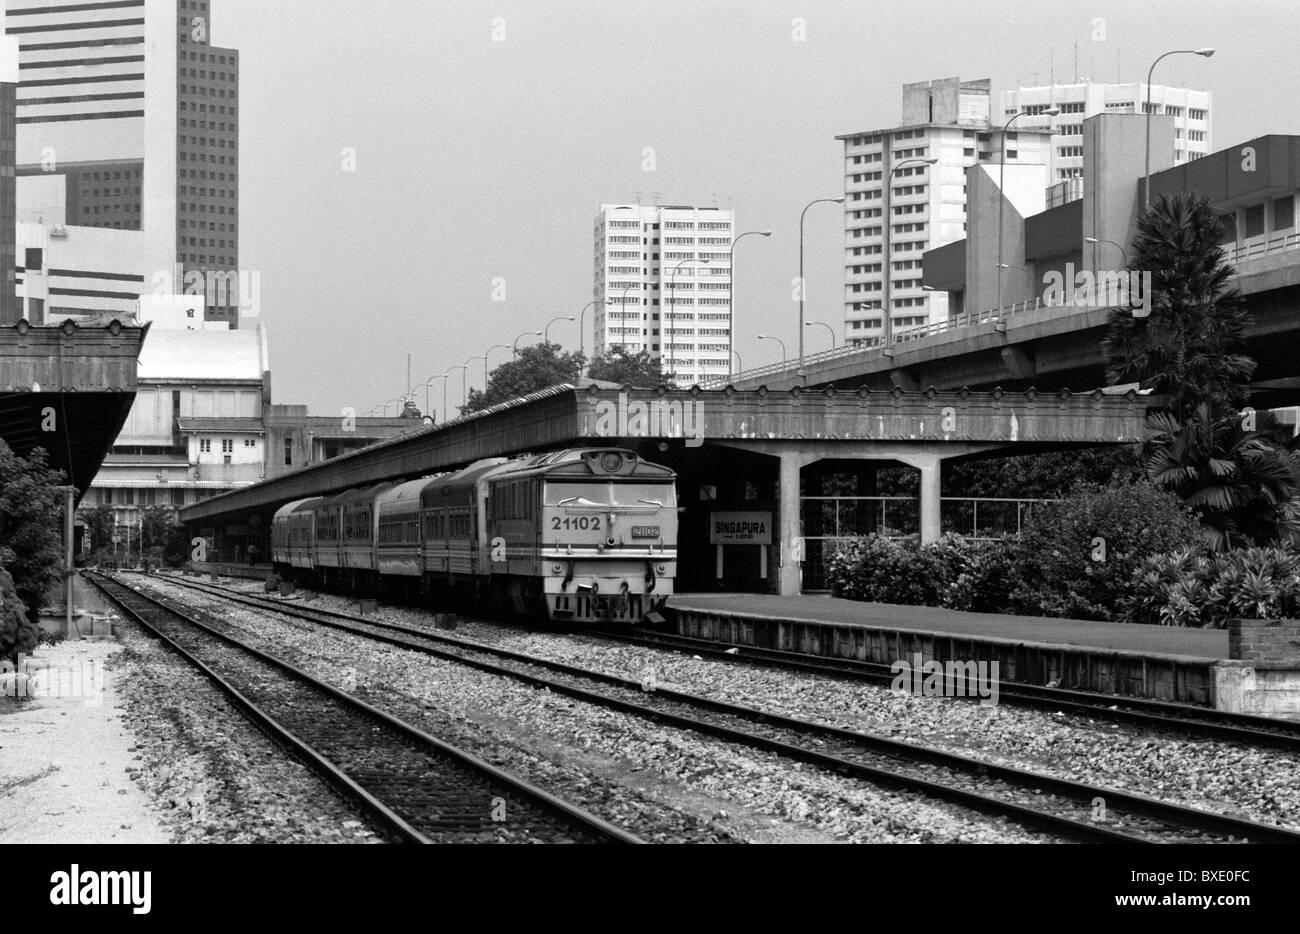 Train at Singapore railway station 1987 - Stock Image